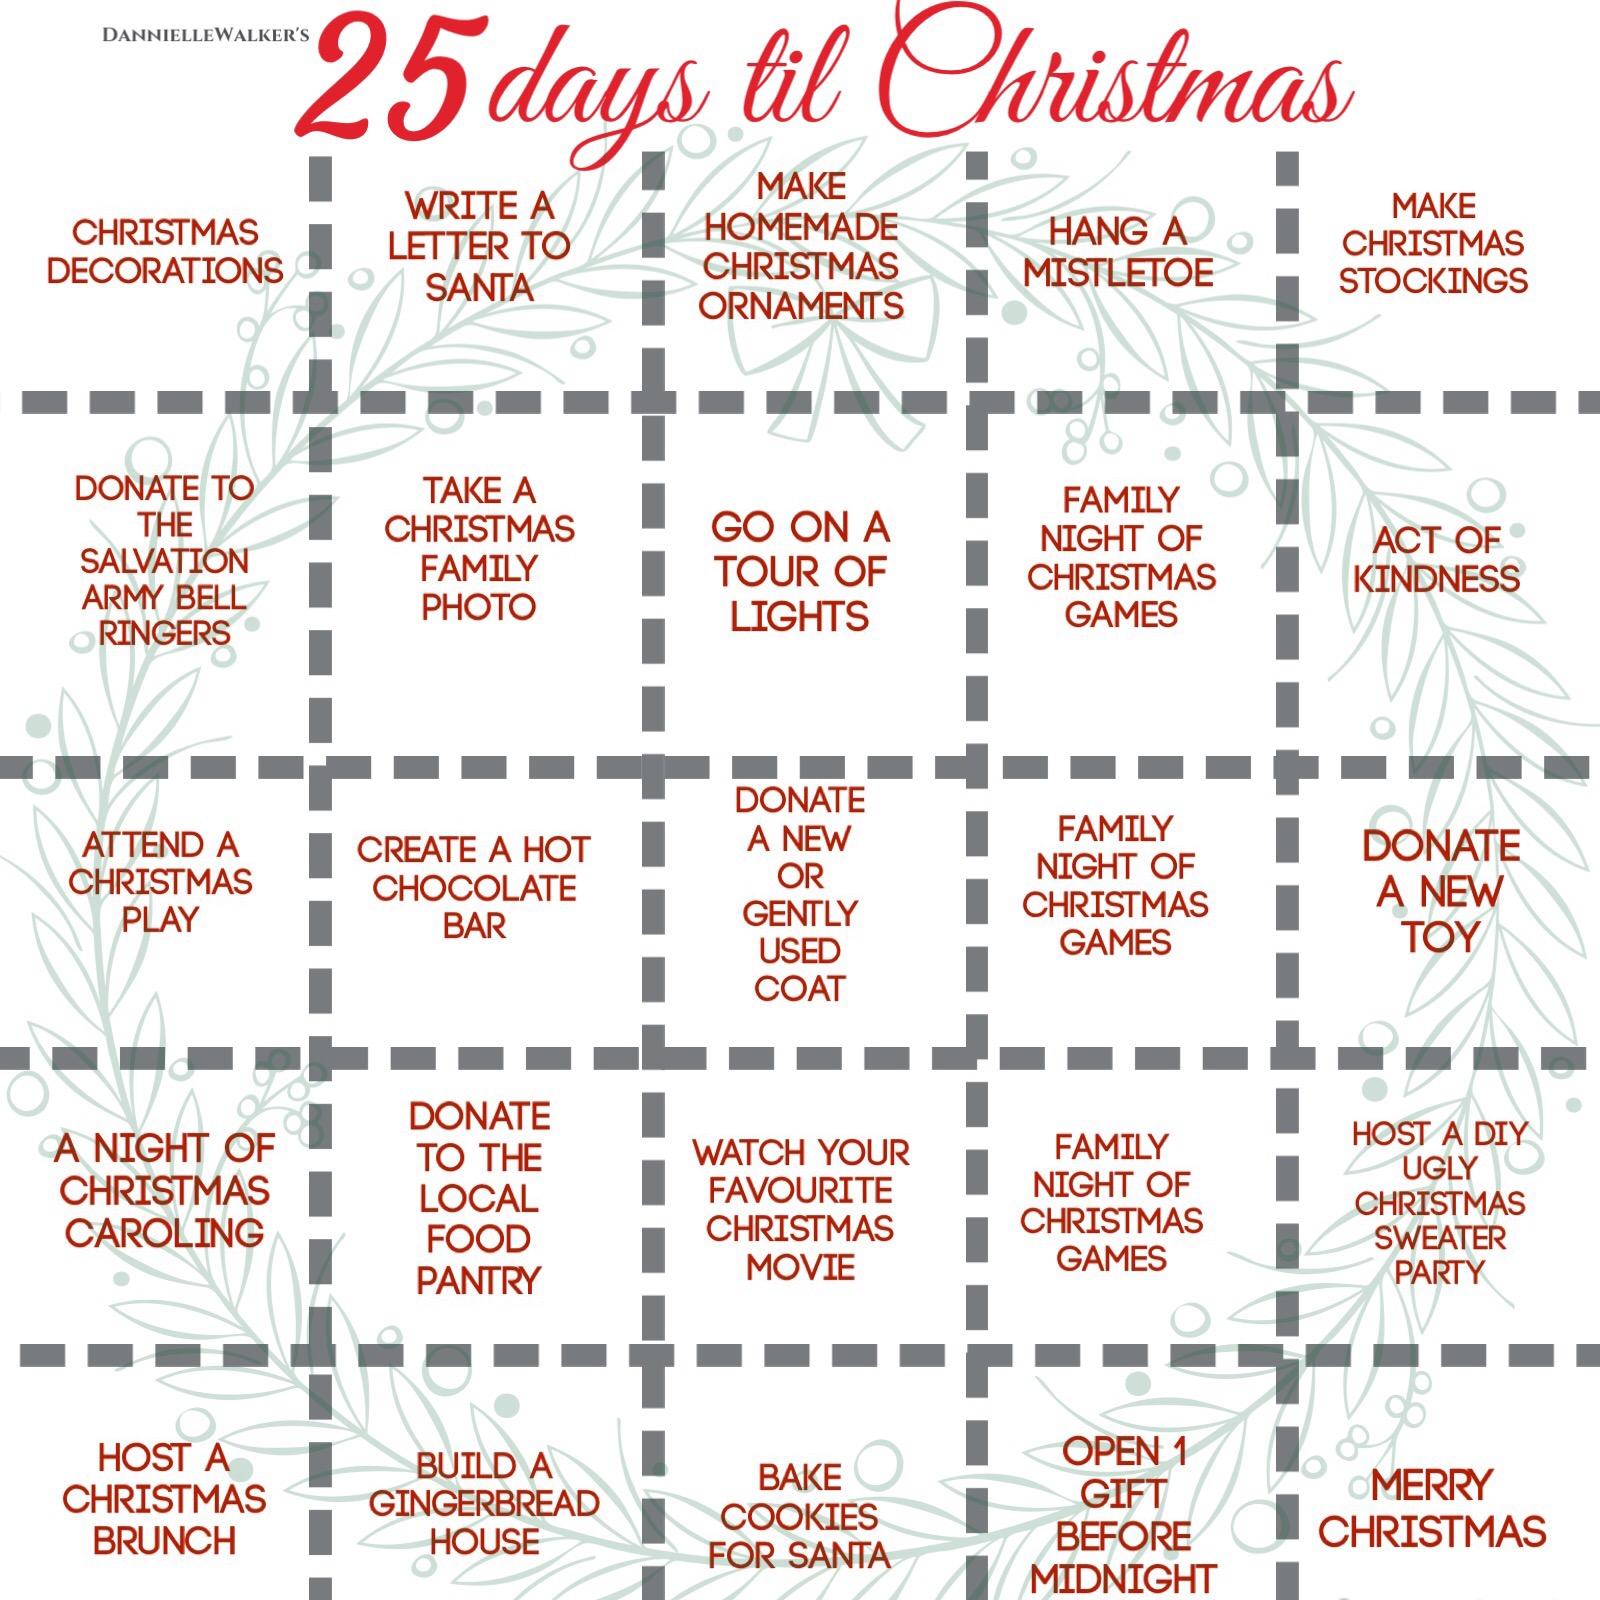 25 days until Christmas list